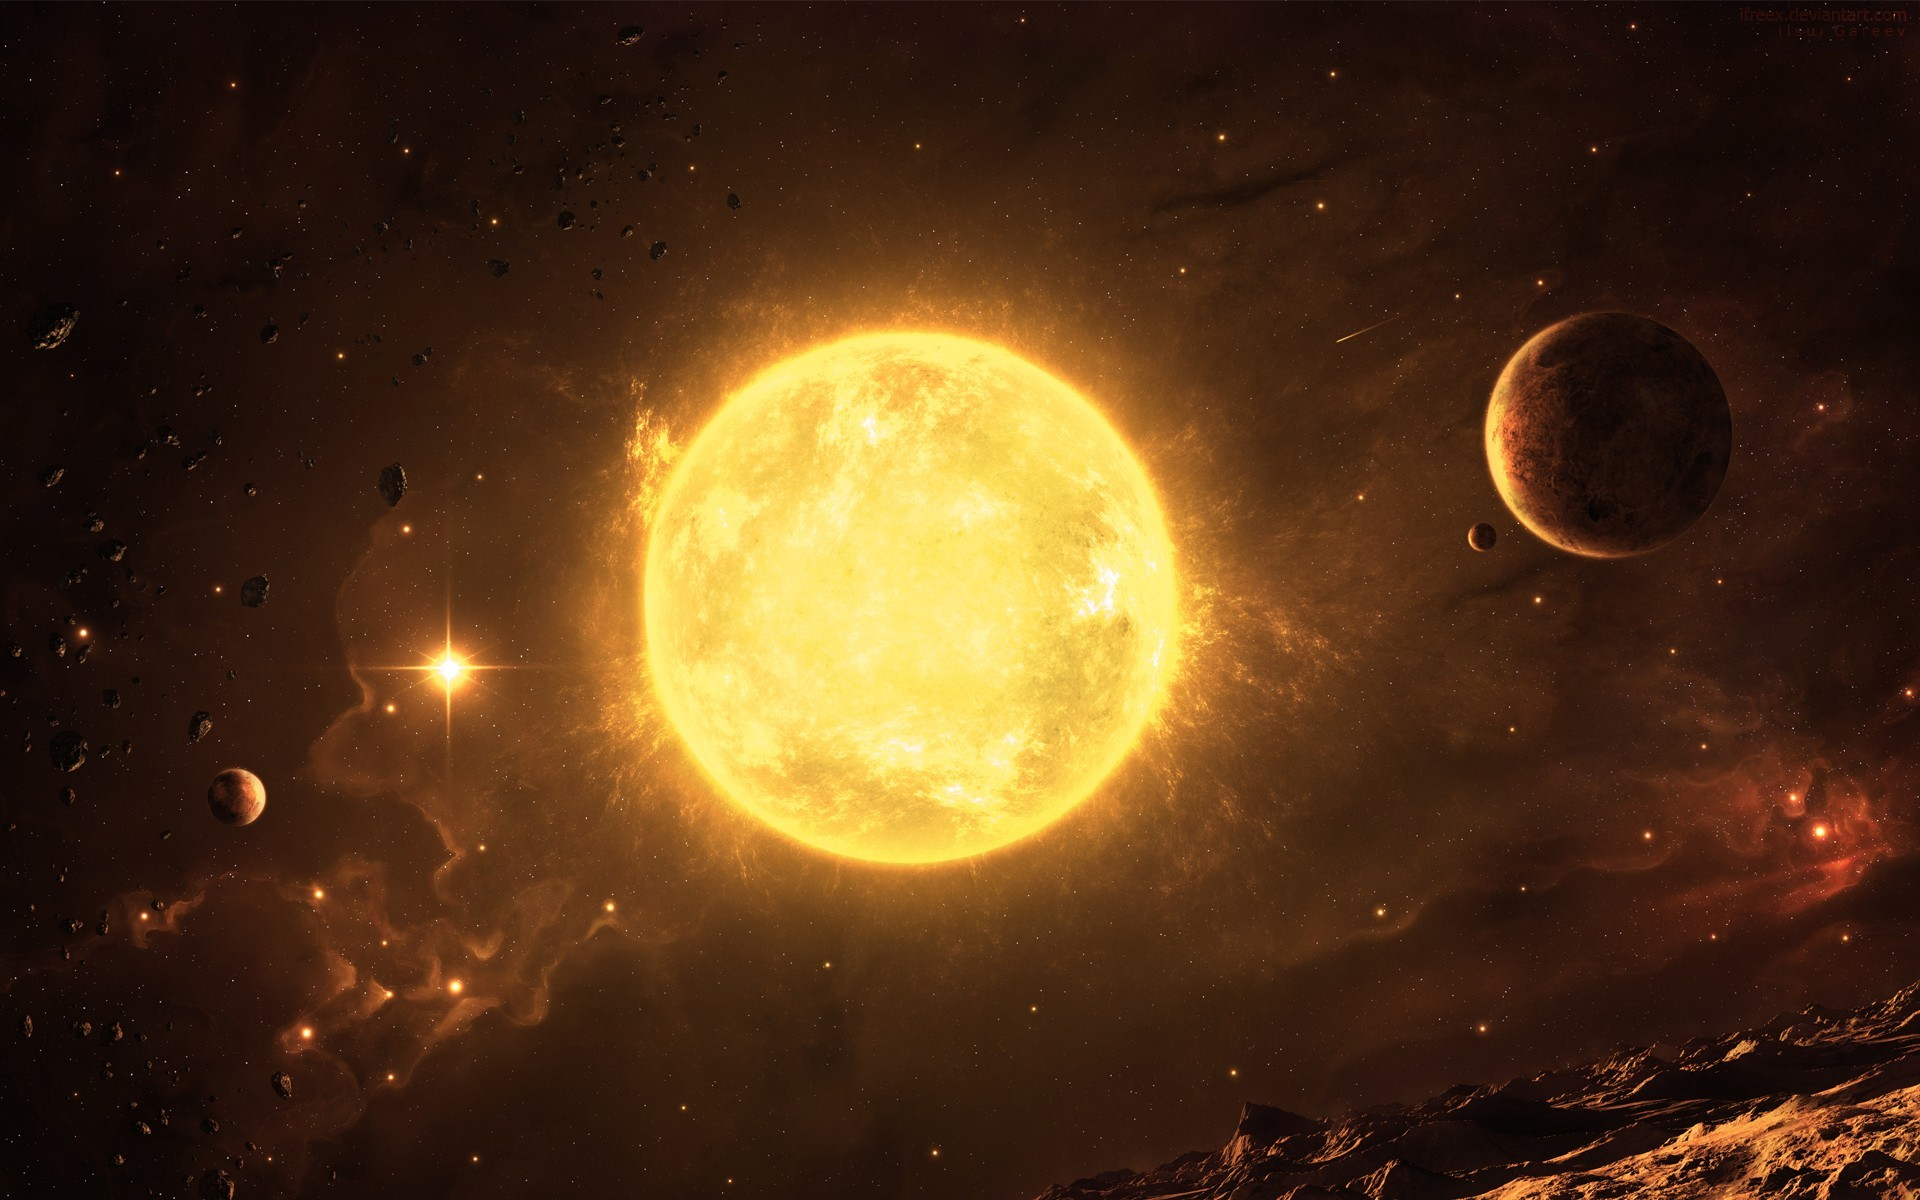 Alien Sun – https://wallpaperzoo.com/alien-sun-46885